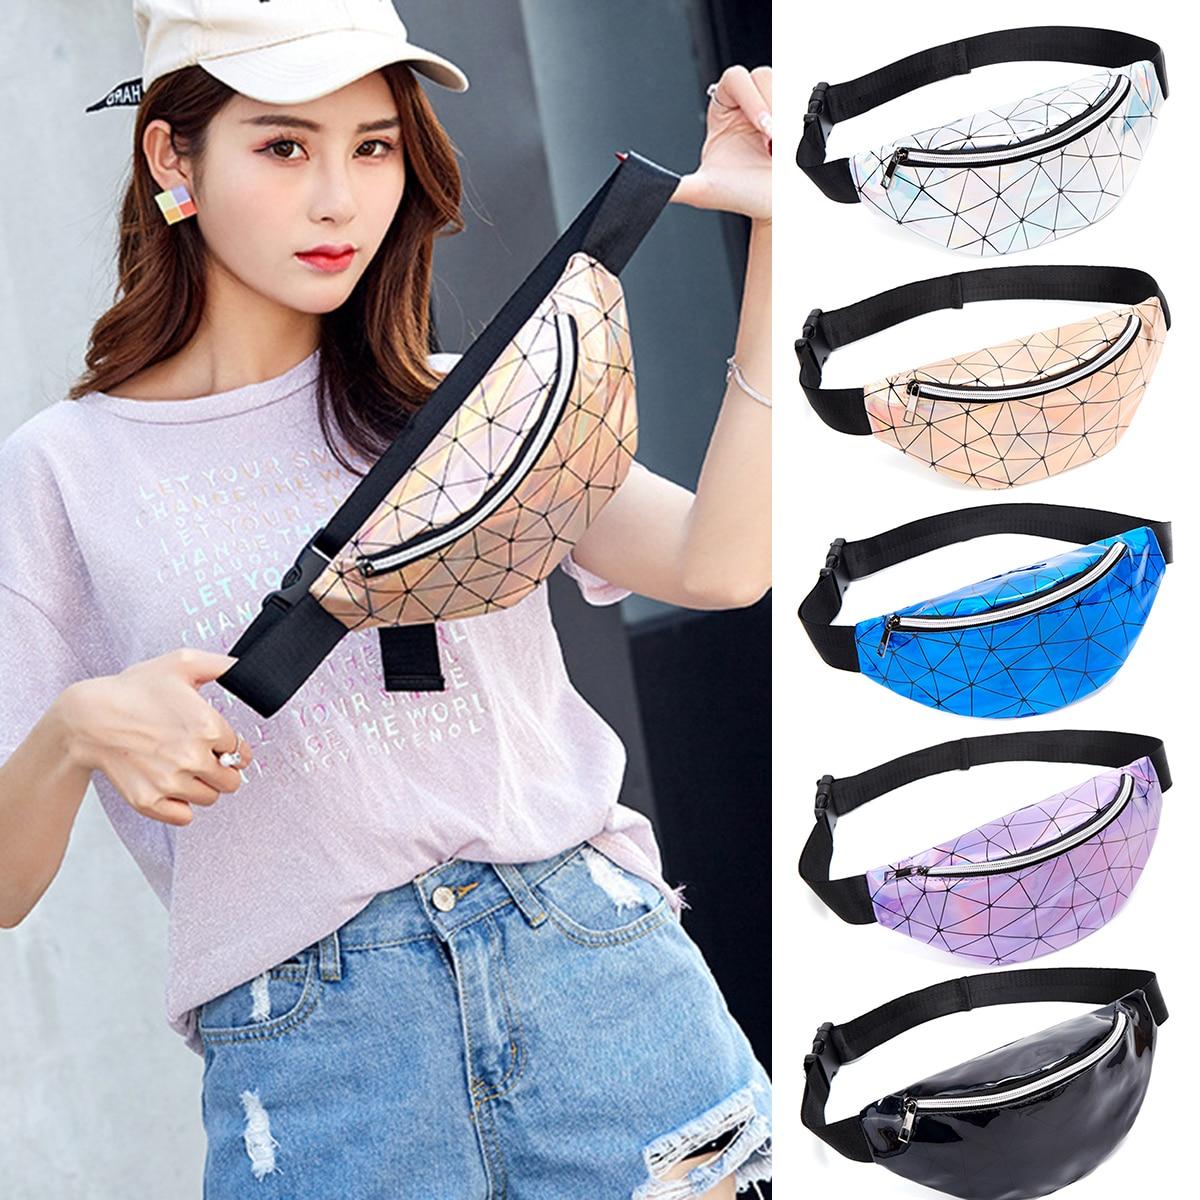 Holographic Waist Bags Women Purple Silver Fanny Pack Female Belt Bag Black Geometric Waist Packs Laser Chest Phone Pouch